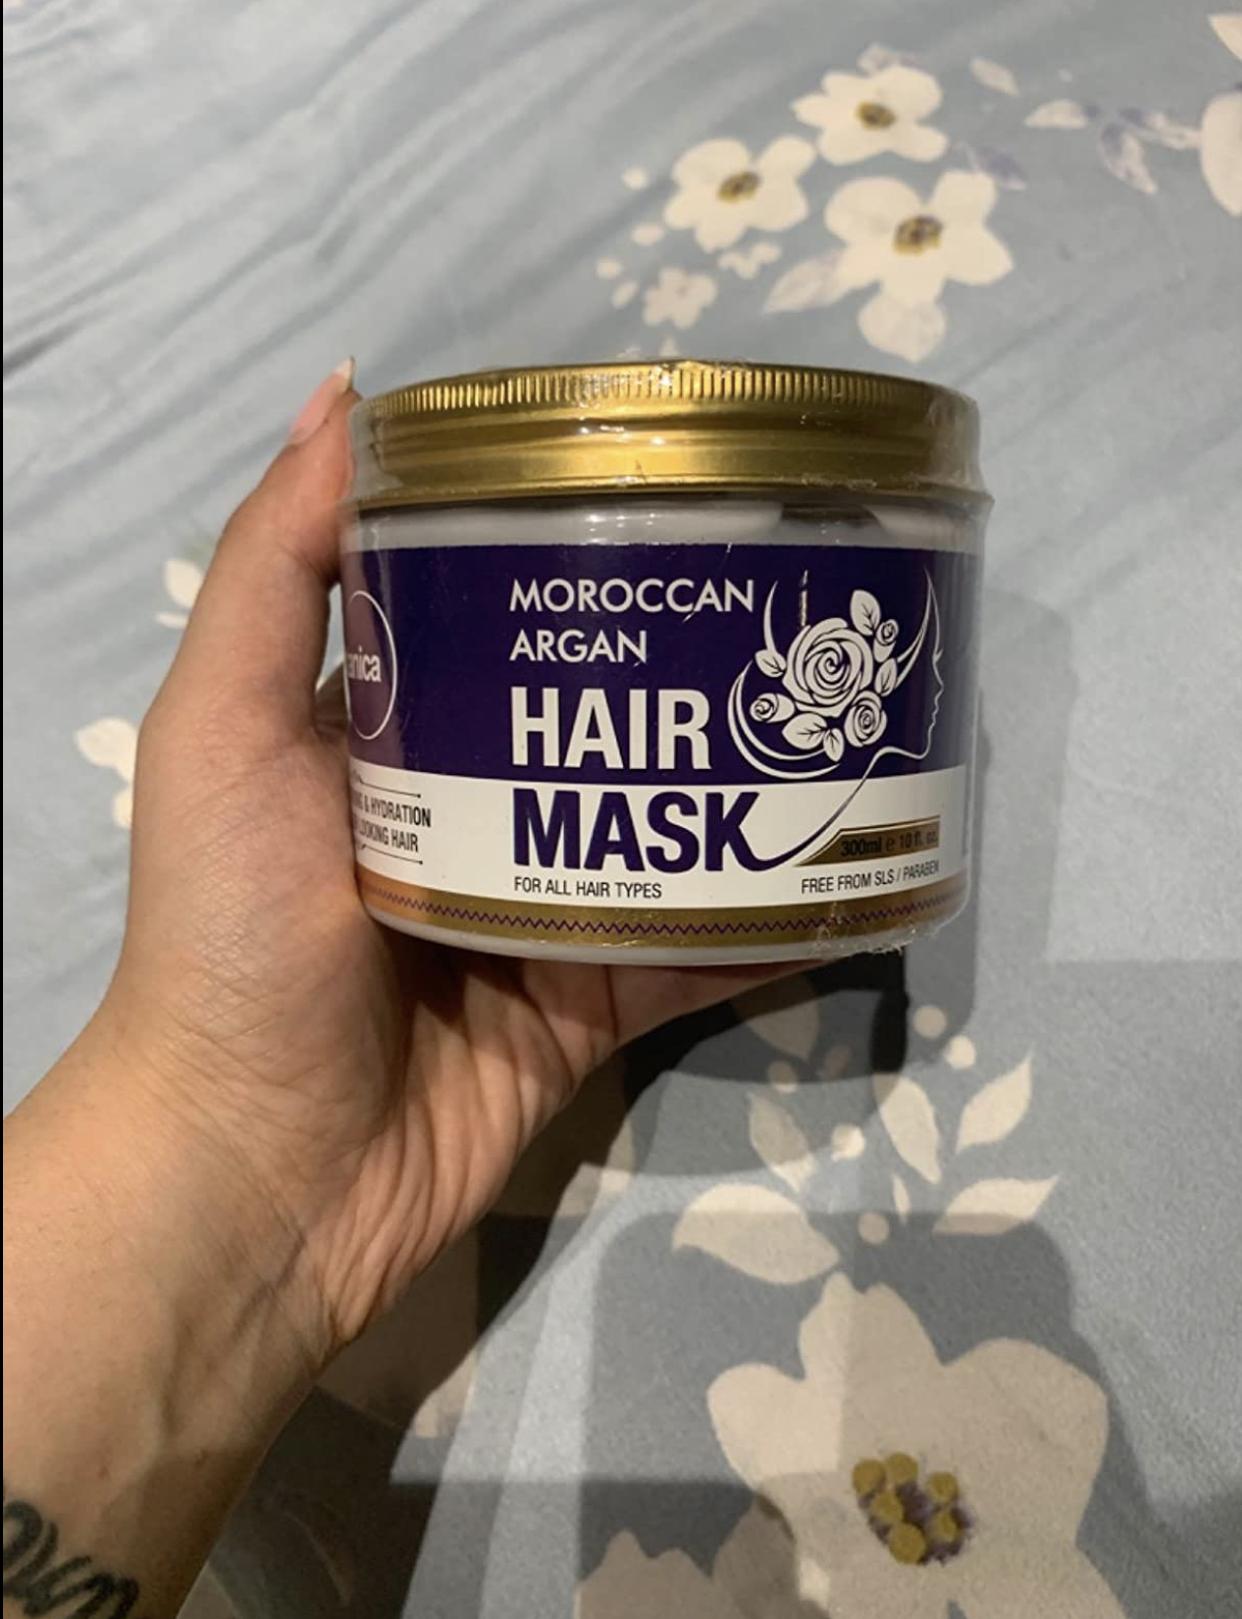 St.Botanica Moroccan Argan Hair Mask-Amazing product-By shivani_makkar-1